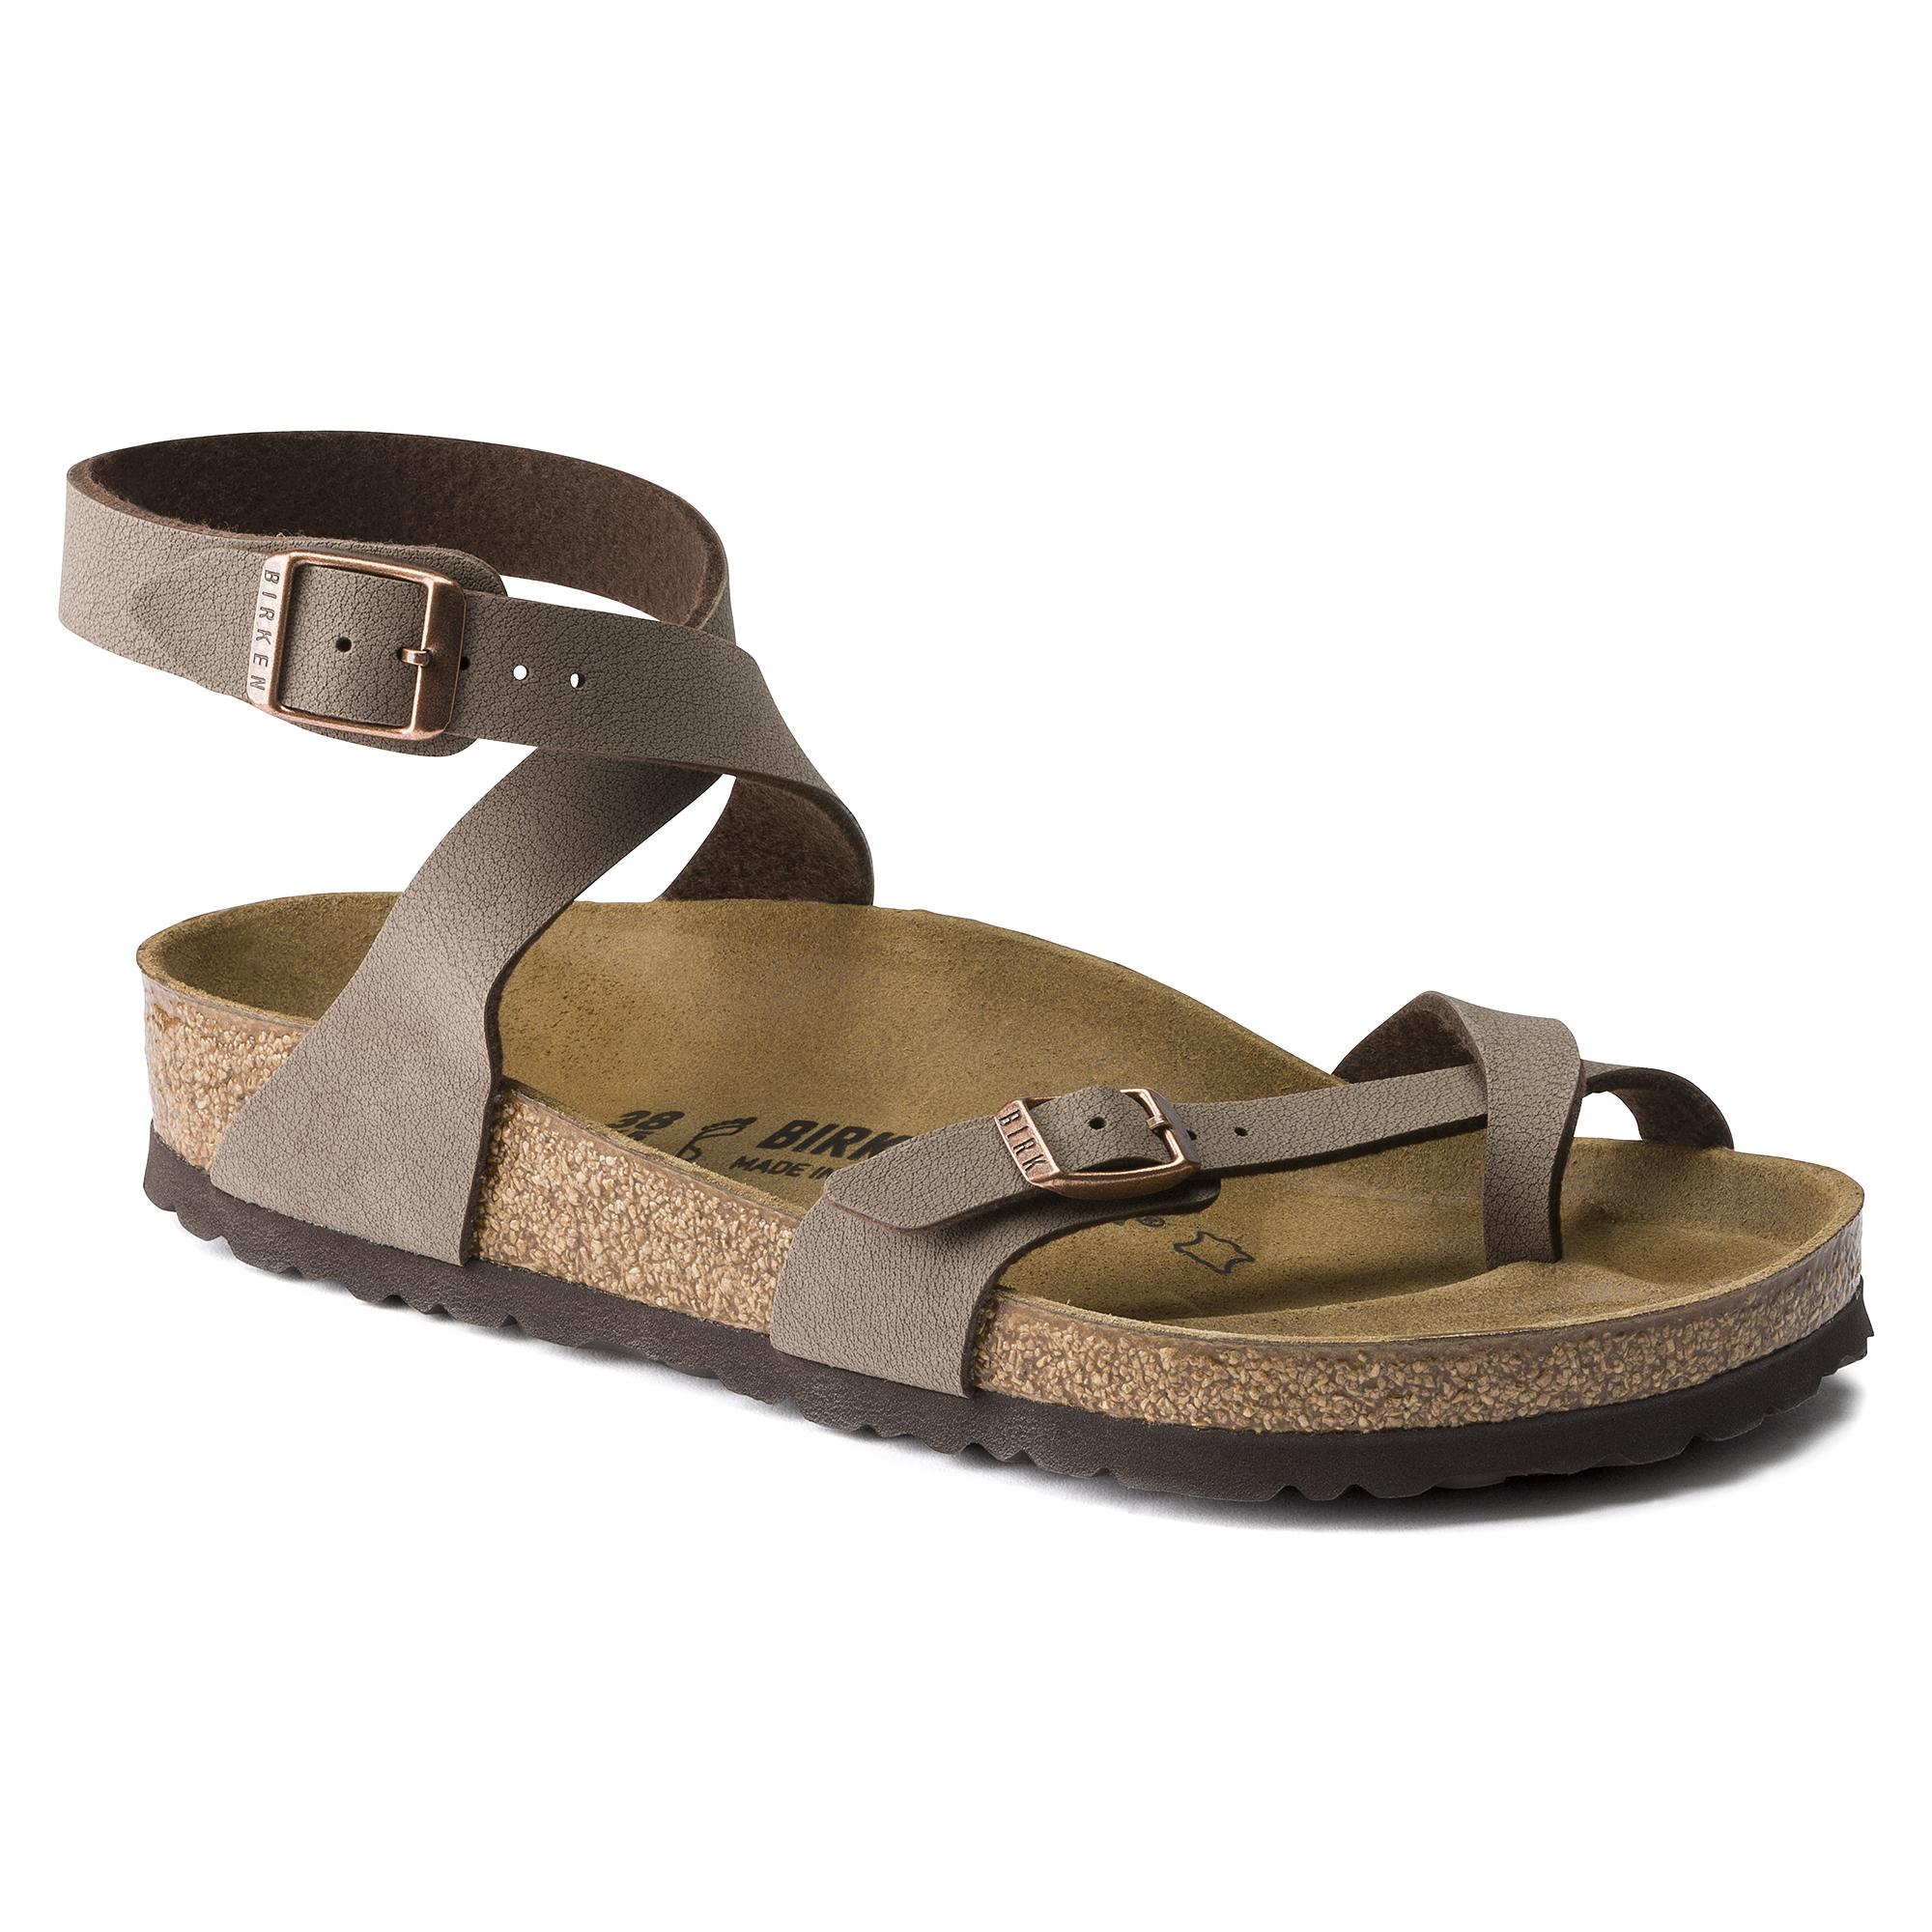 Birkenstock Yara Sandals | Birkenstock yara sandals